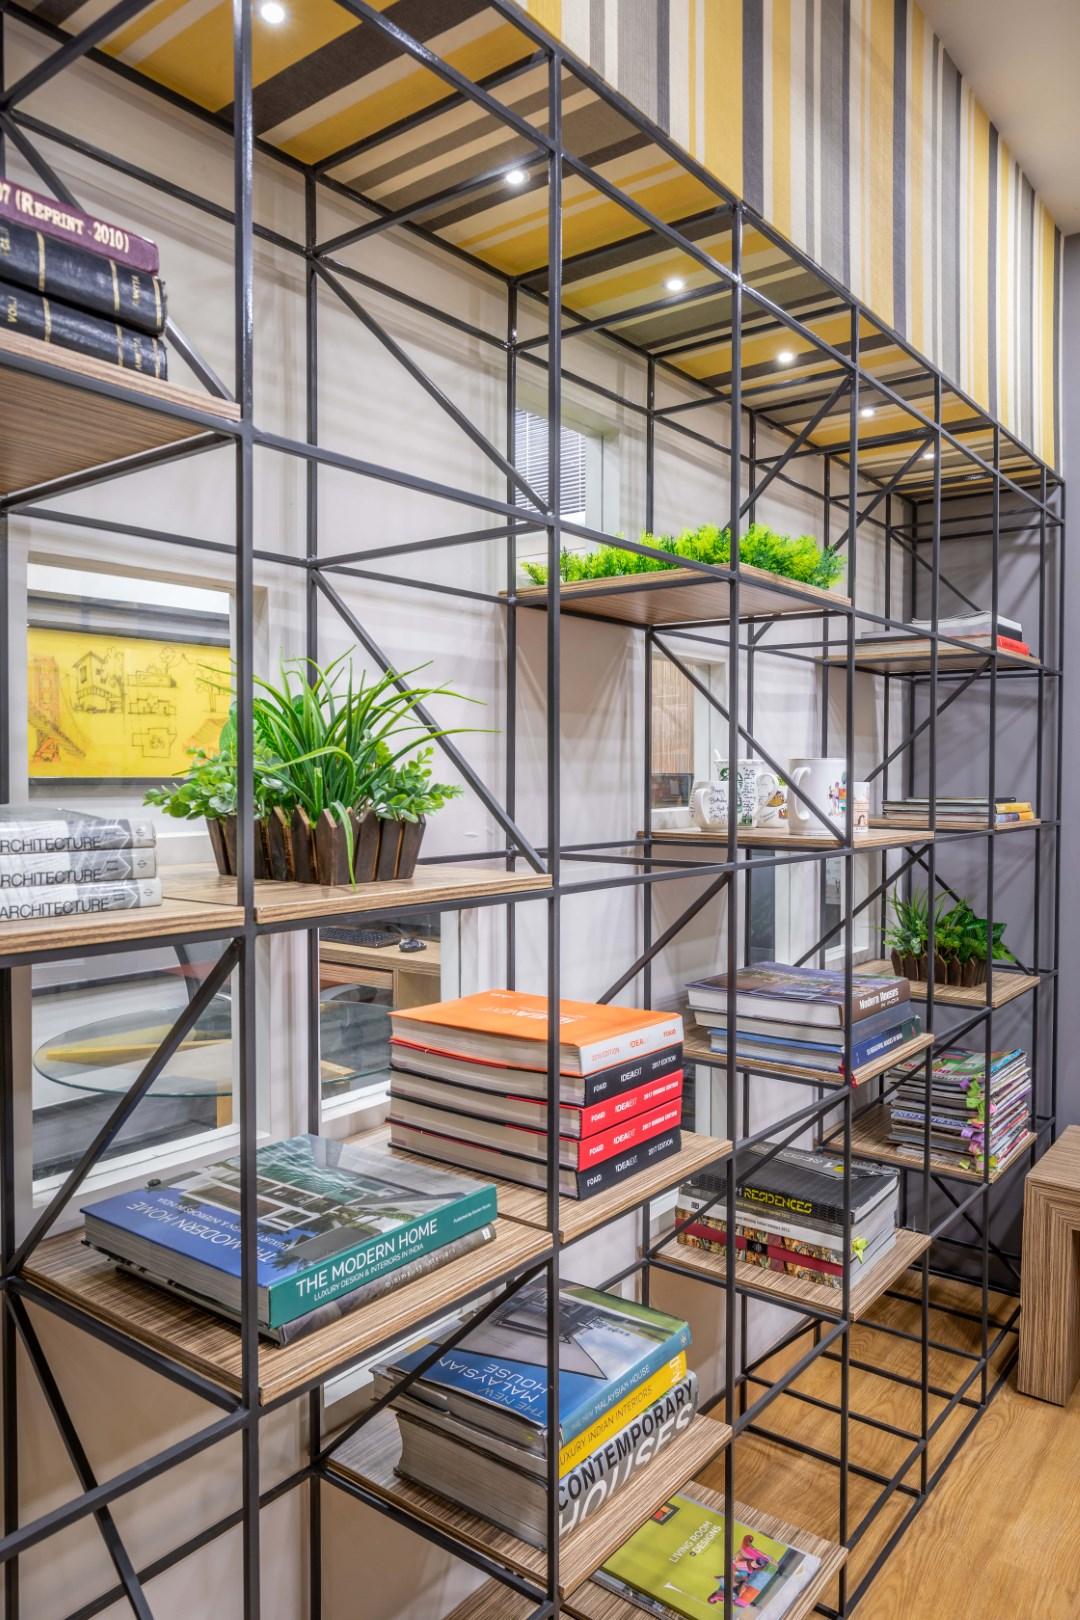 Studio AVT 2 0 - Architectural Studio - The Architects Diary